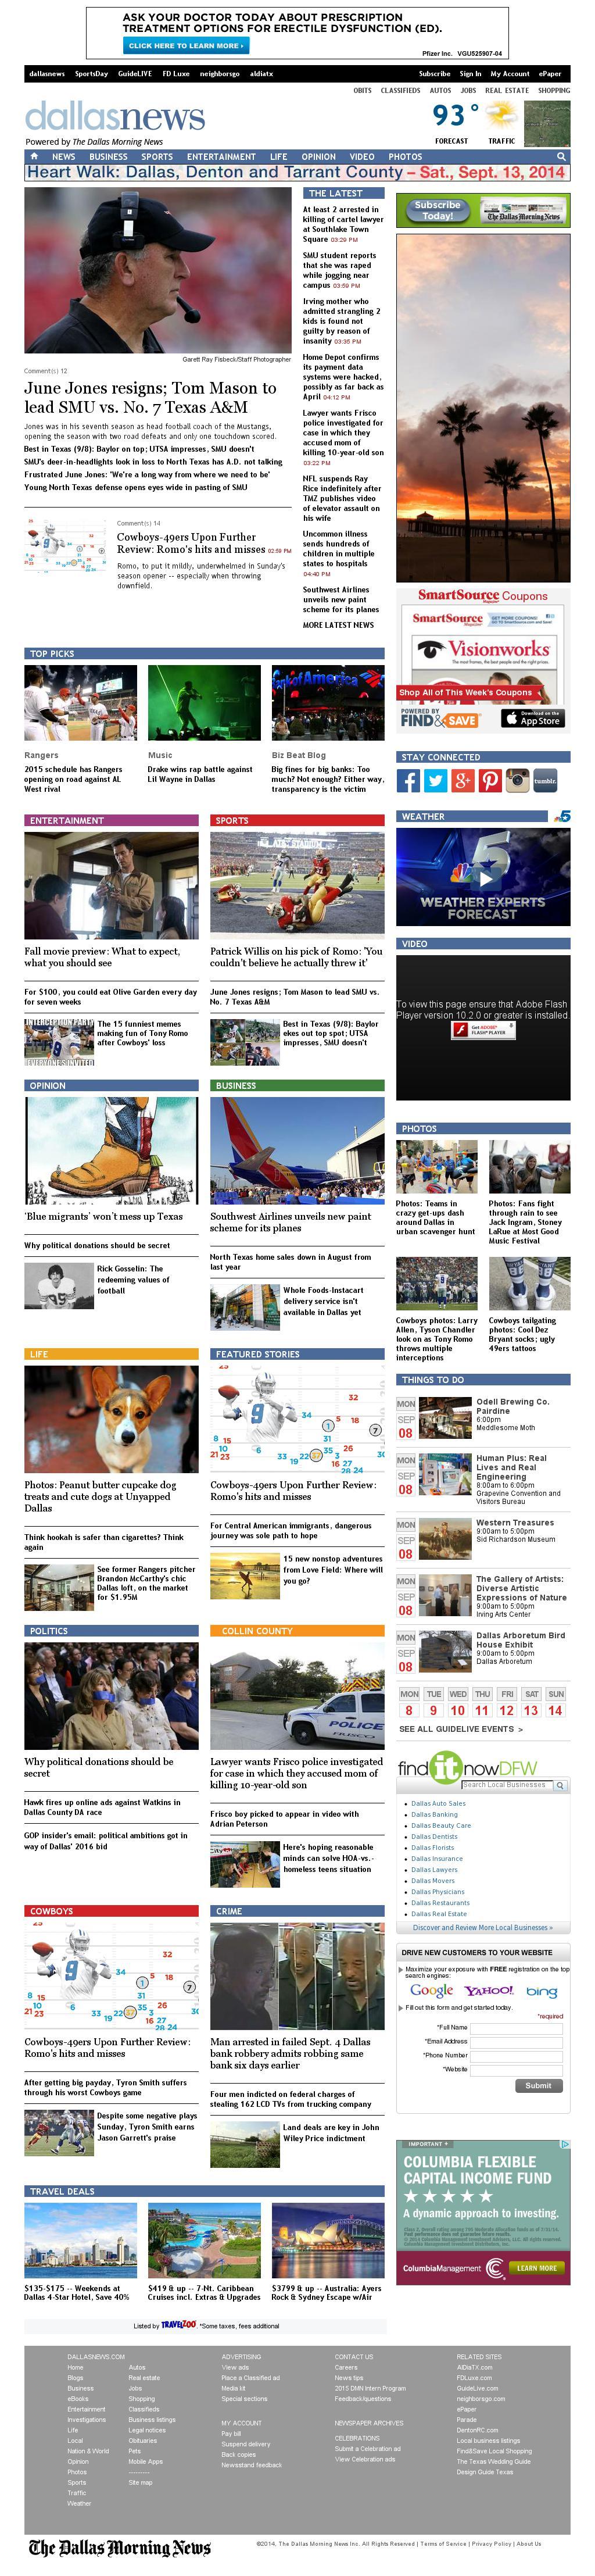 dallasnews.com at Monday Sept. 8, 2014, 10:05 p.m. UTC